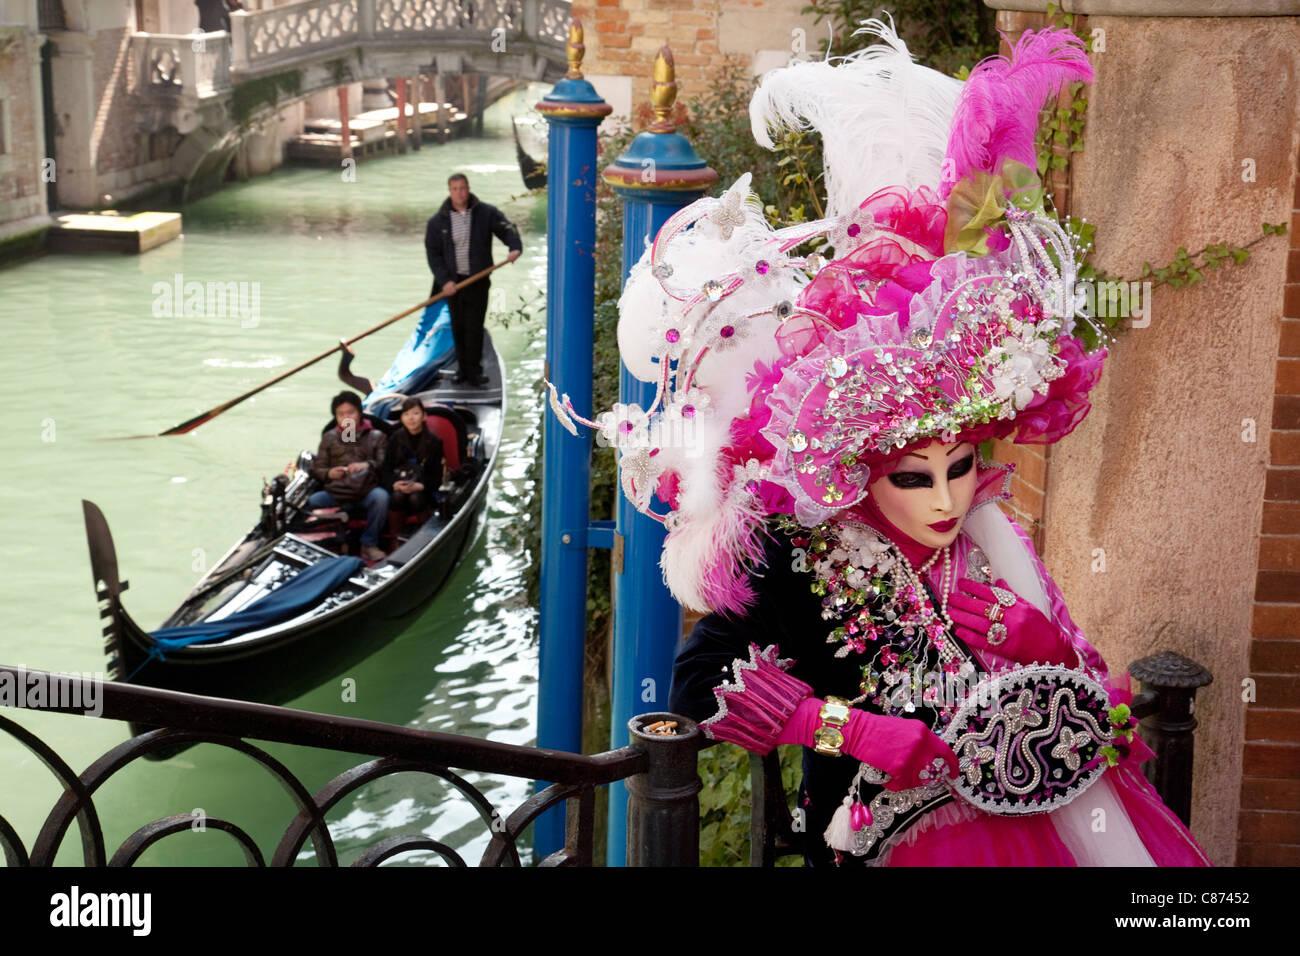 Gondola and masquerader in mask, the Venice Carnival, Venice, Italy Stock Photo